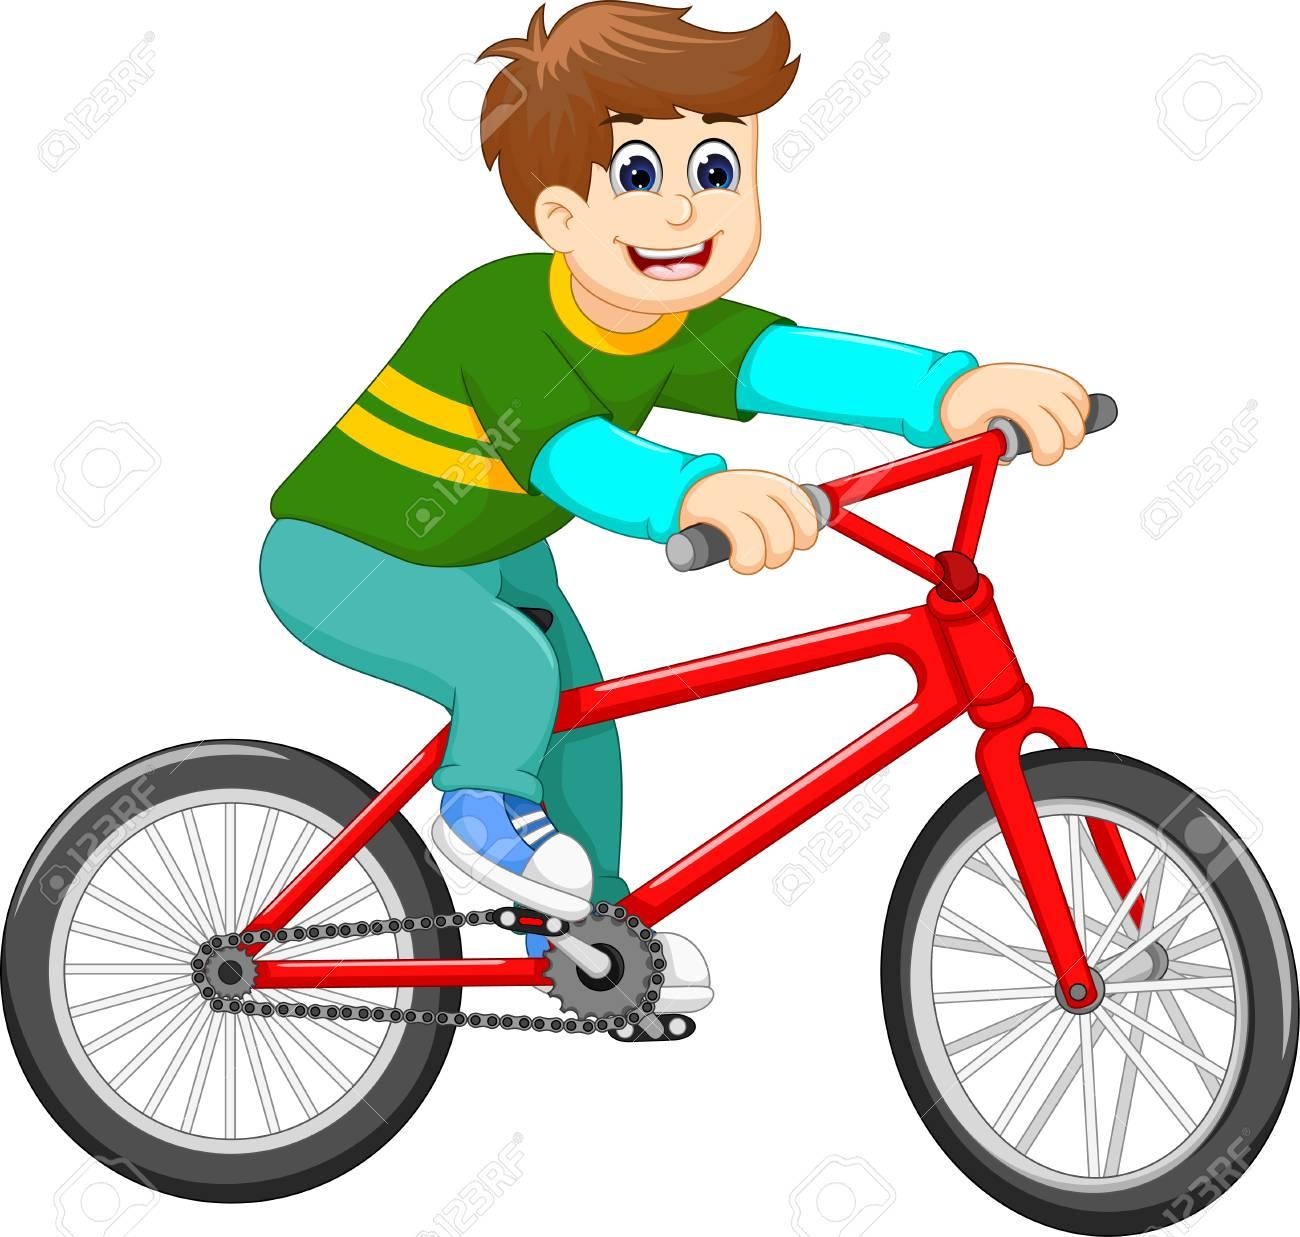 Funny boy riding bicycle cartoon.